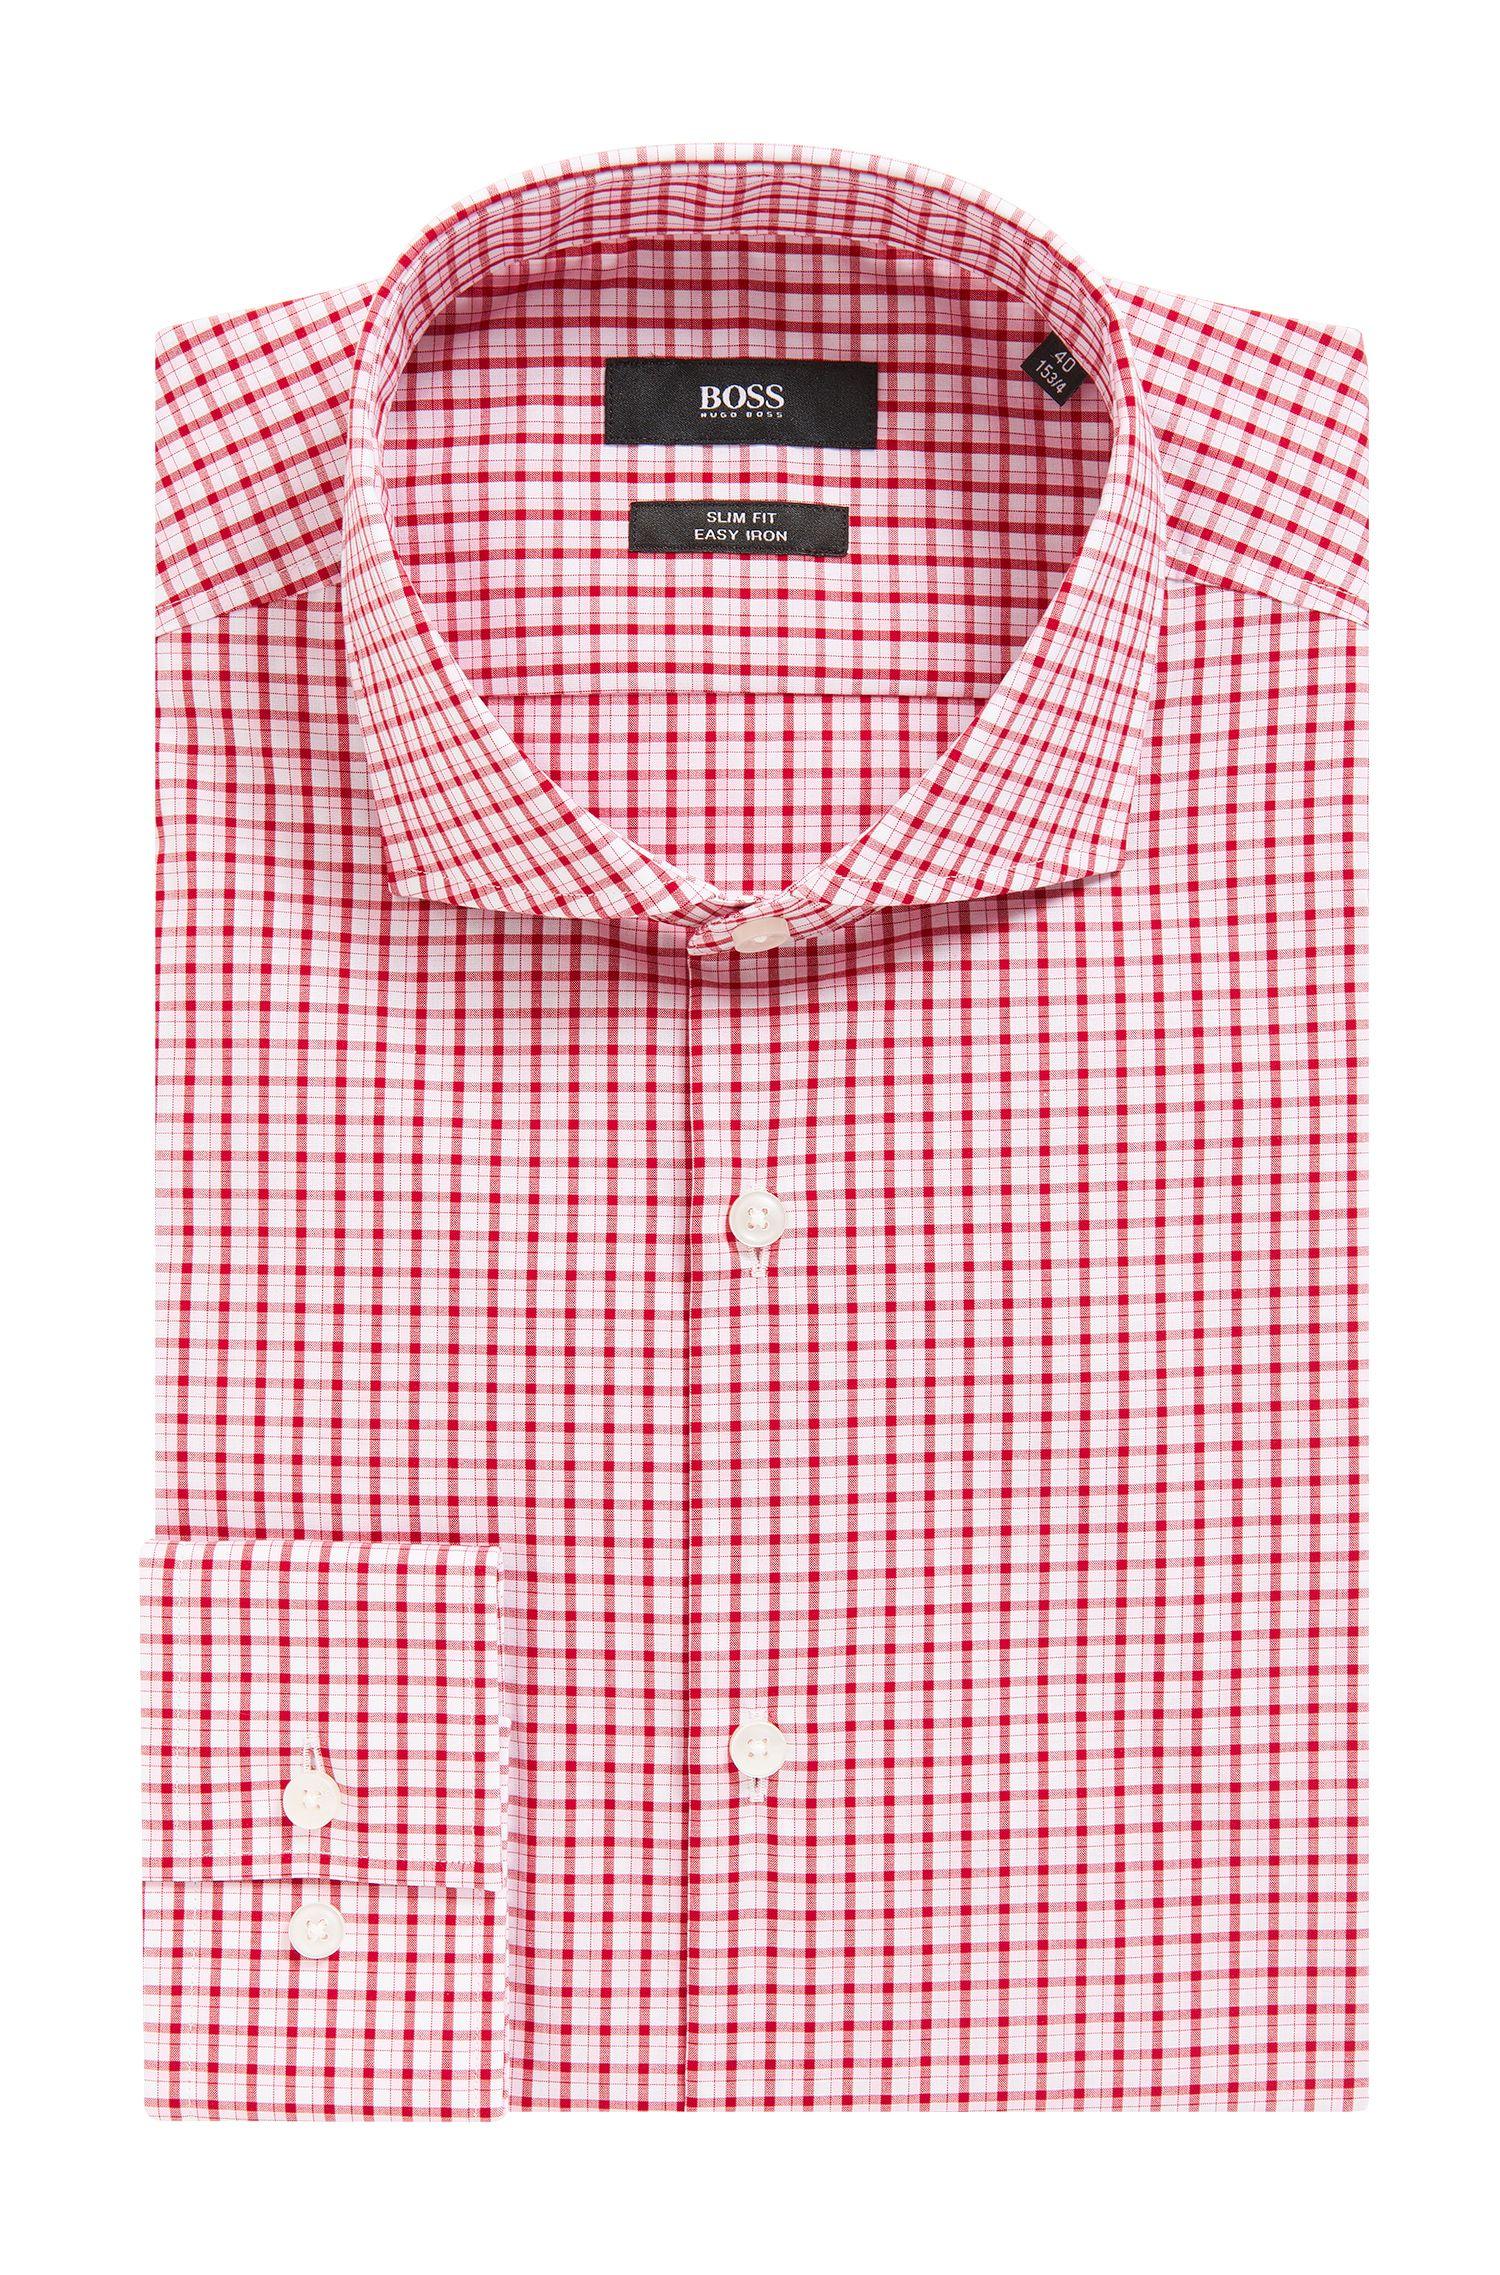 Checked Easy Iron Cotton Dress Shirt, Slim Fit   Jason